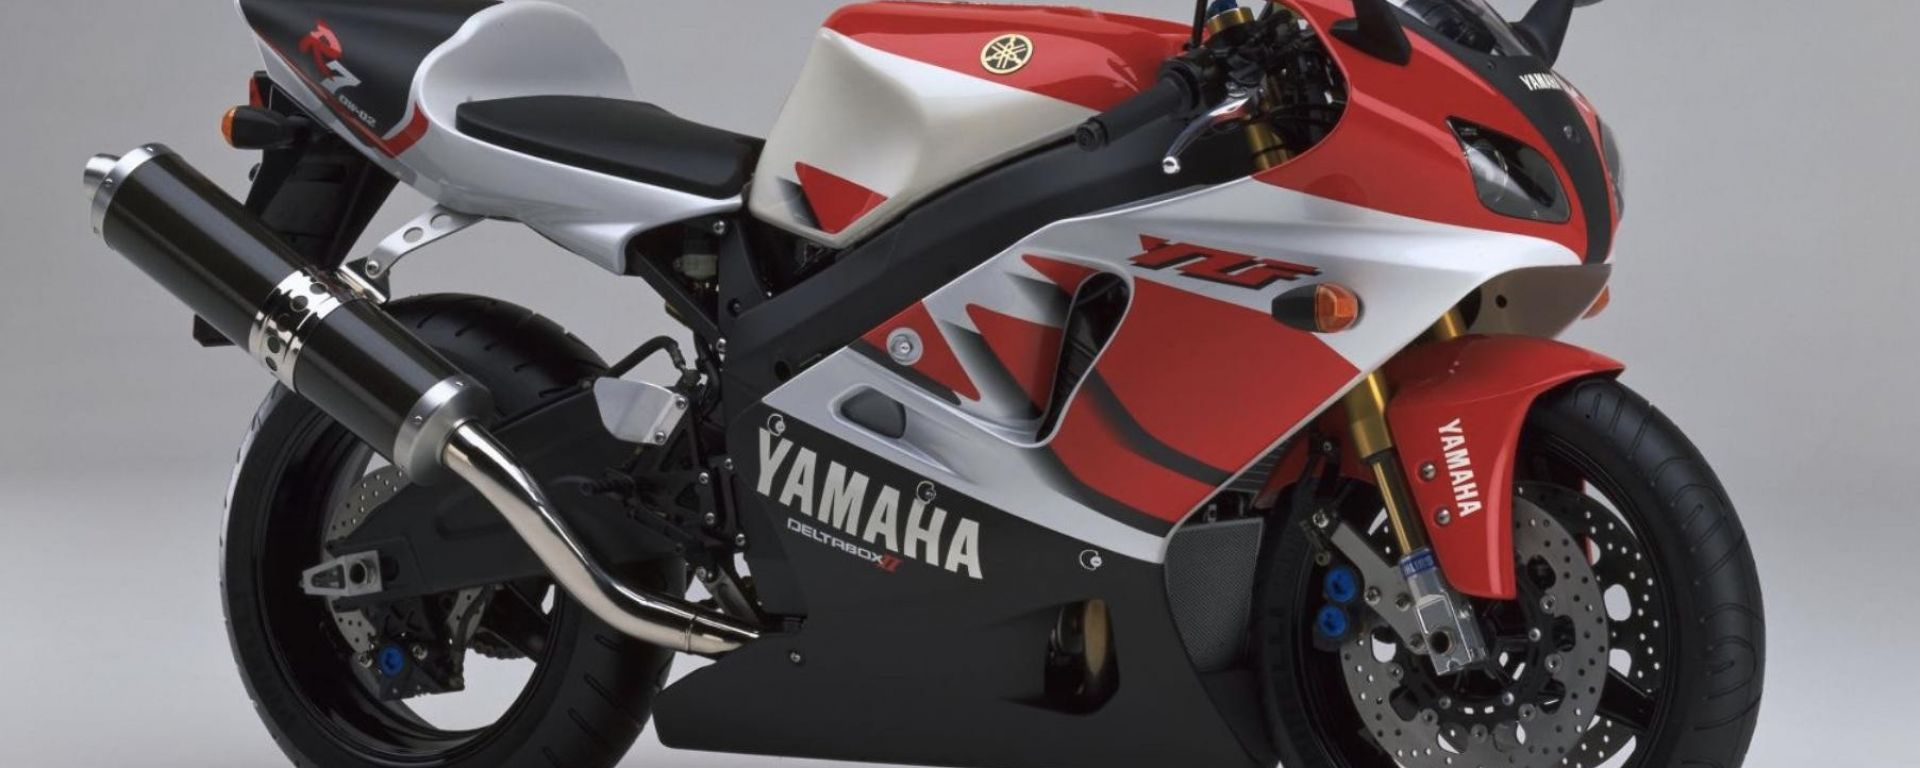 Yamaha YZF-R7: la superbike degli anni 90